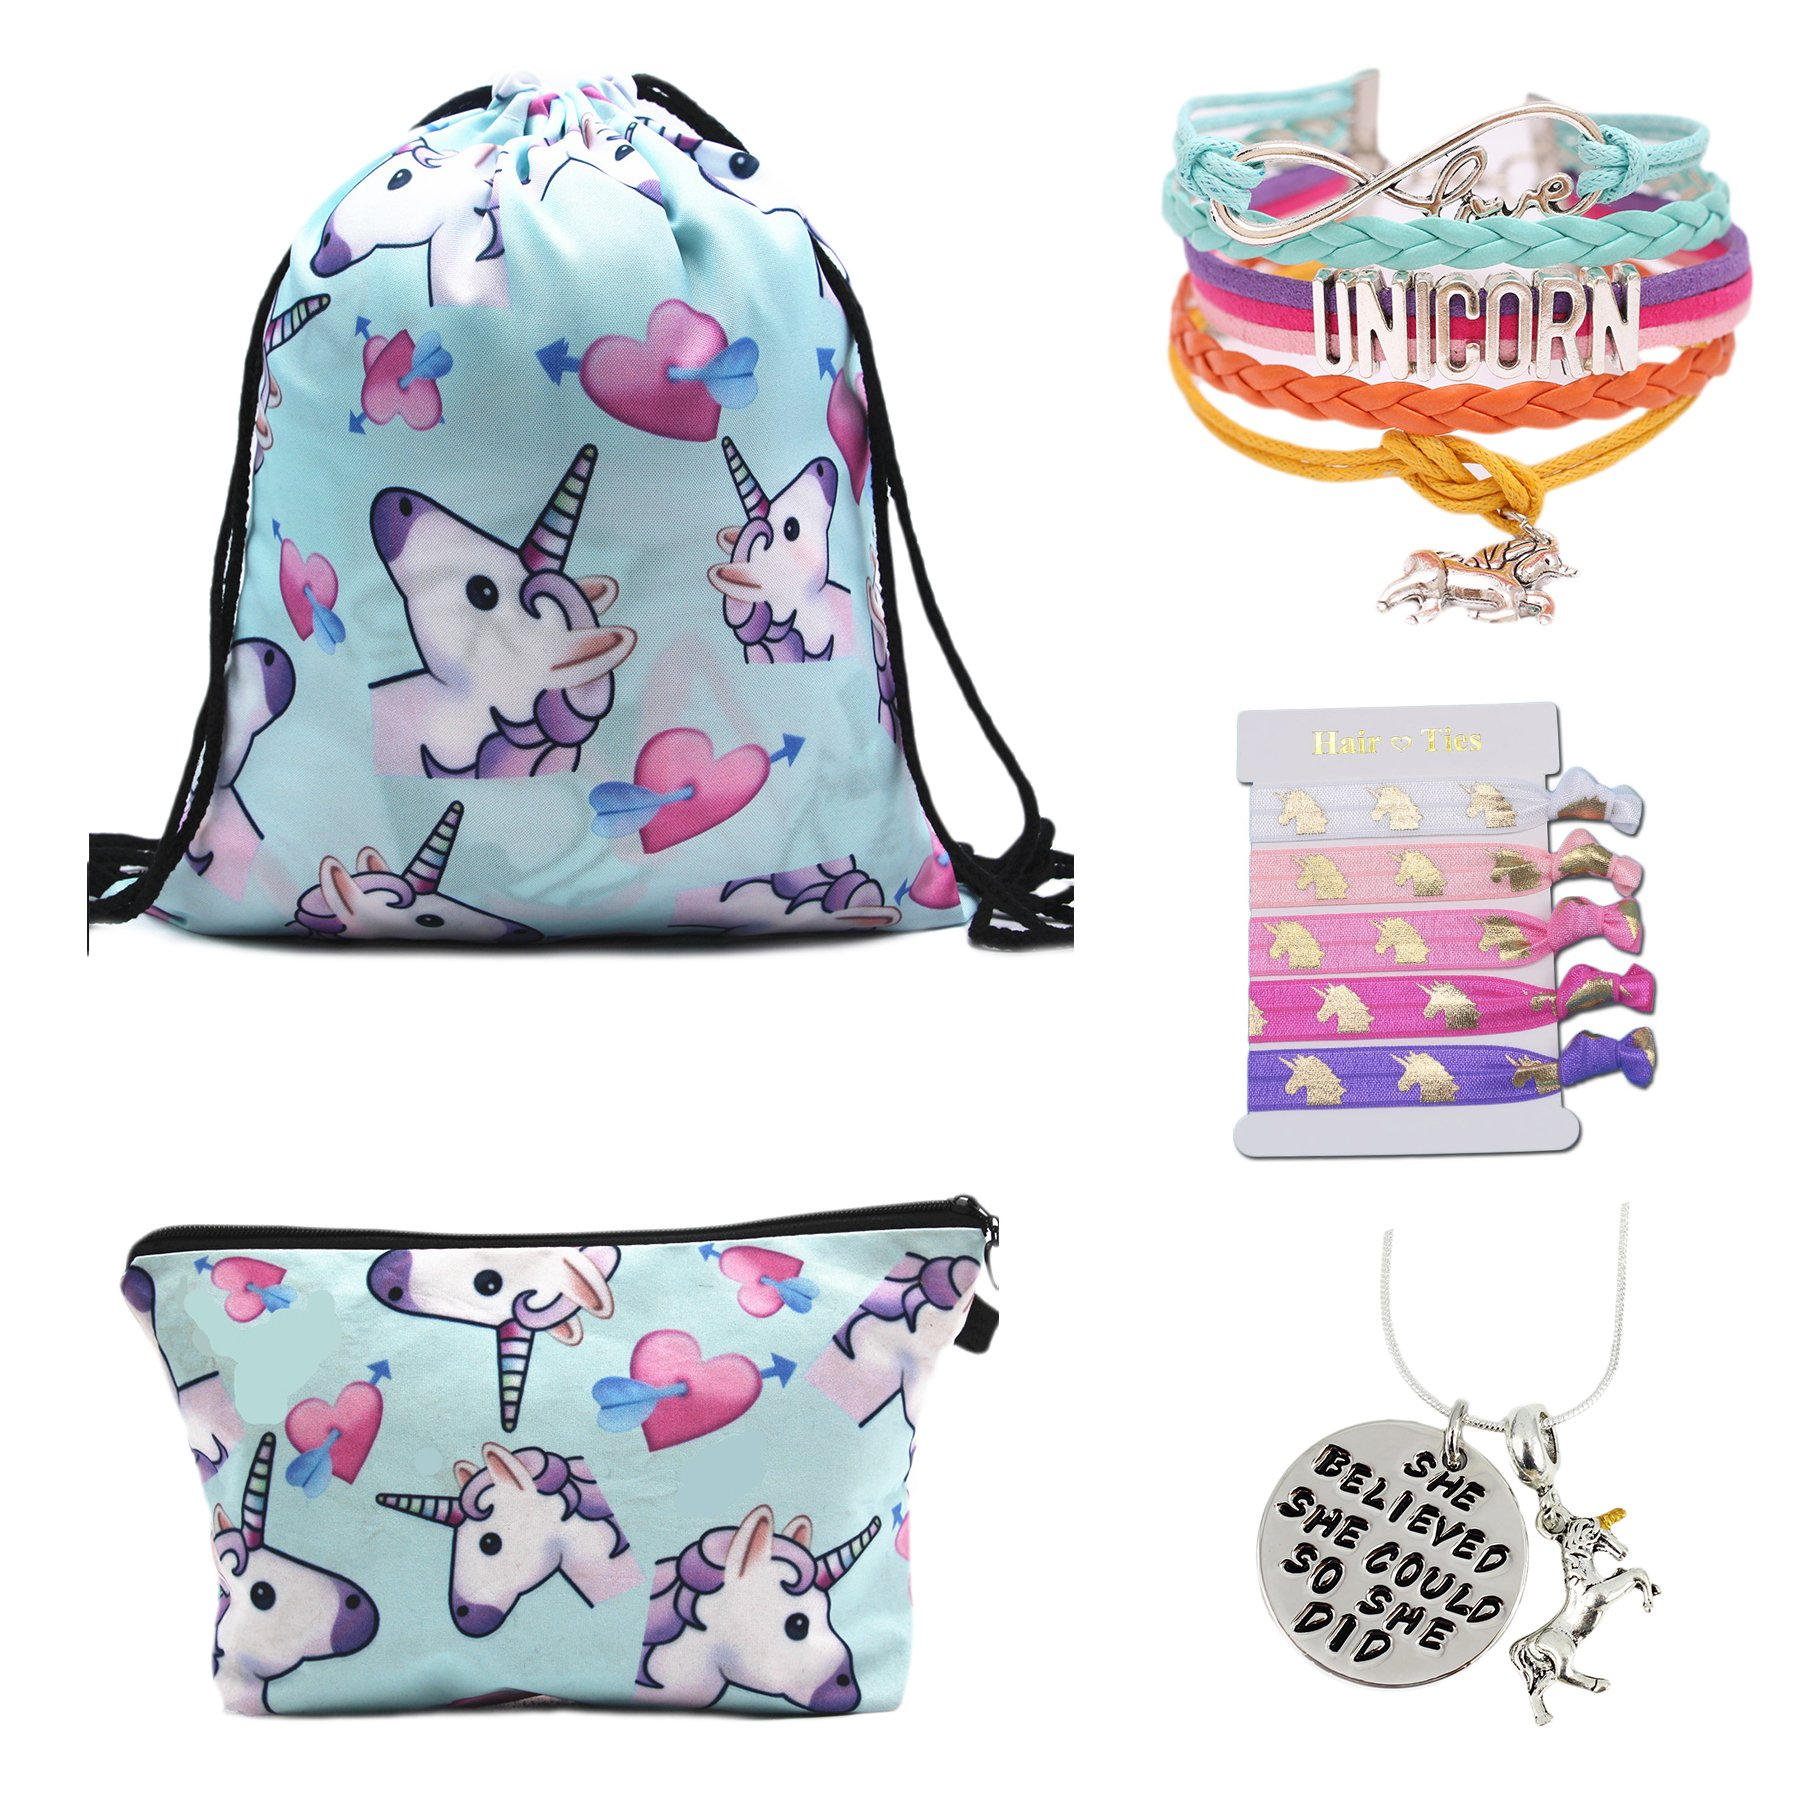 Unicorn Gifts for Girls - Unicorn Drawstring Backpack/Makeup Bag/Bracelet/Inspirational Necklace/Hair Ties (New Blue)